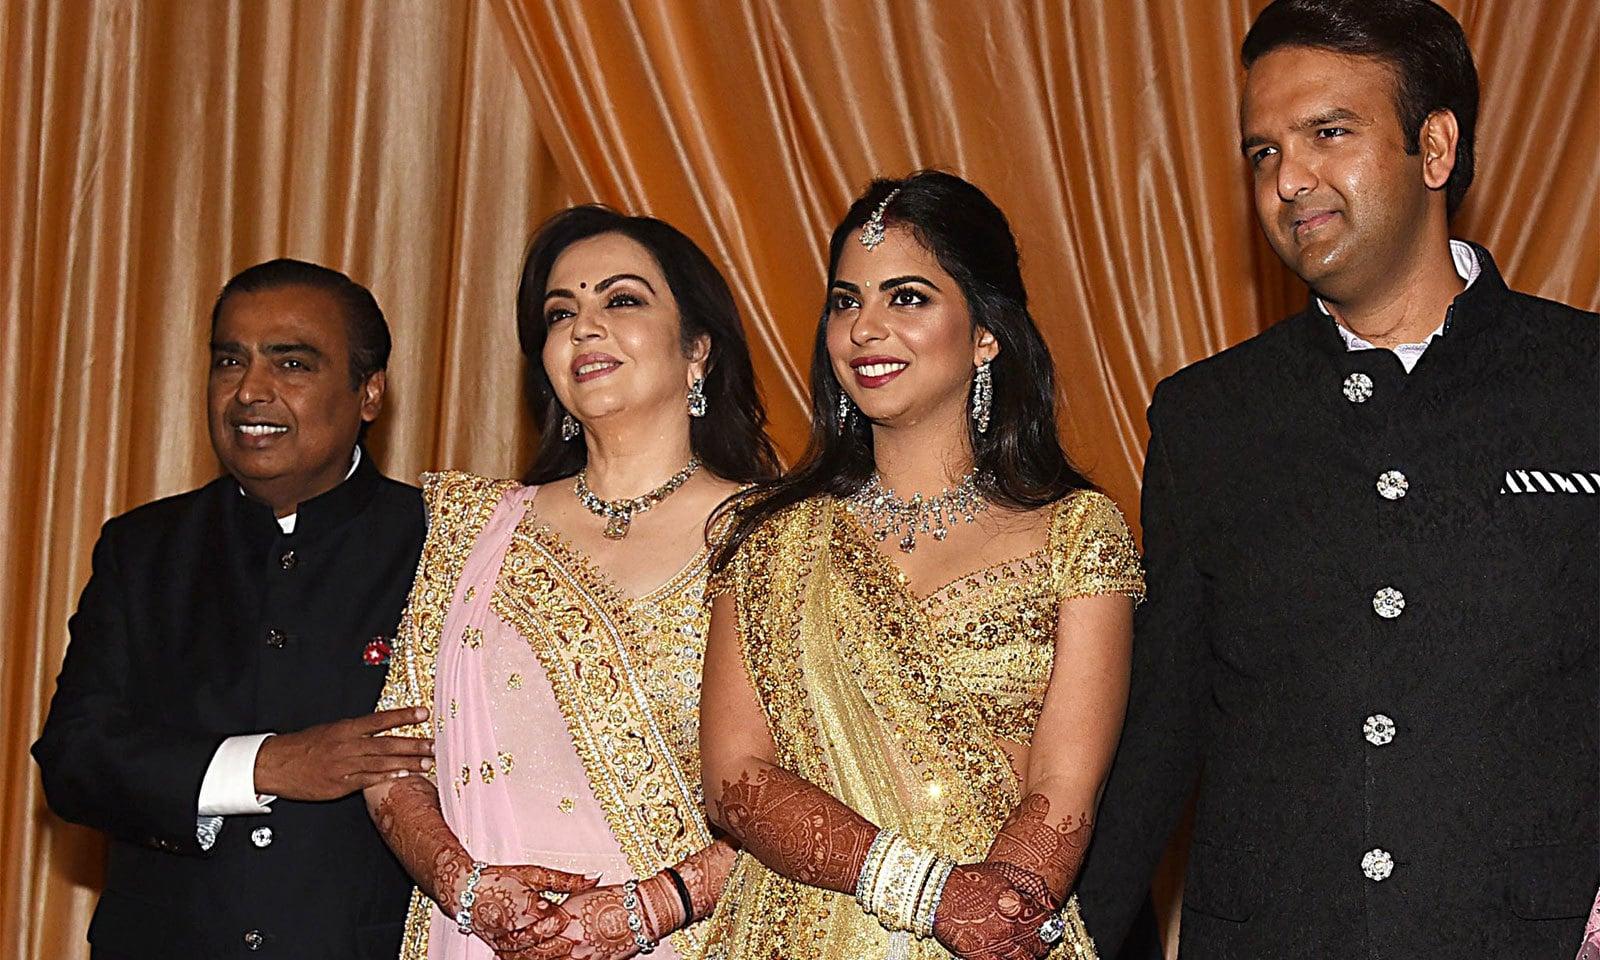 دنیا کی مہنگی ترین شادی کرنے والے امبانی خاندان کی پرتعیش زندگی